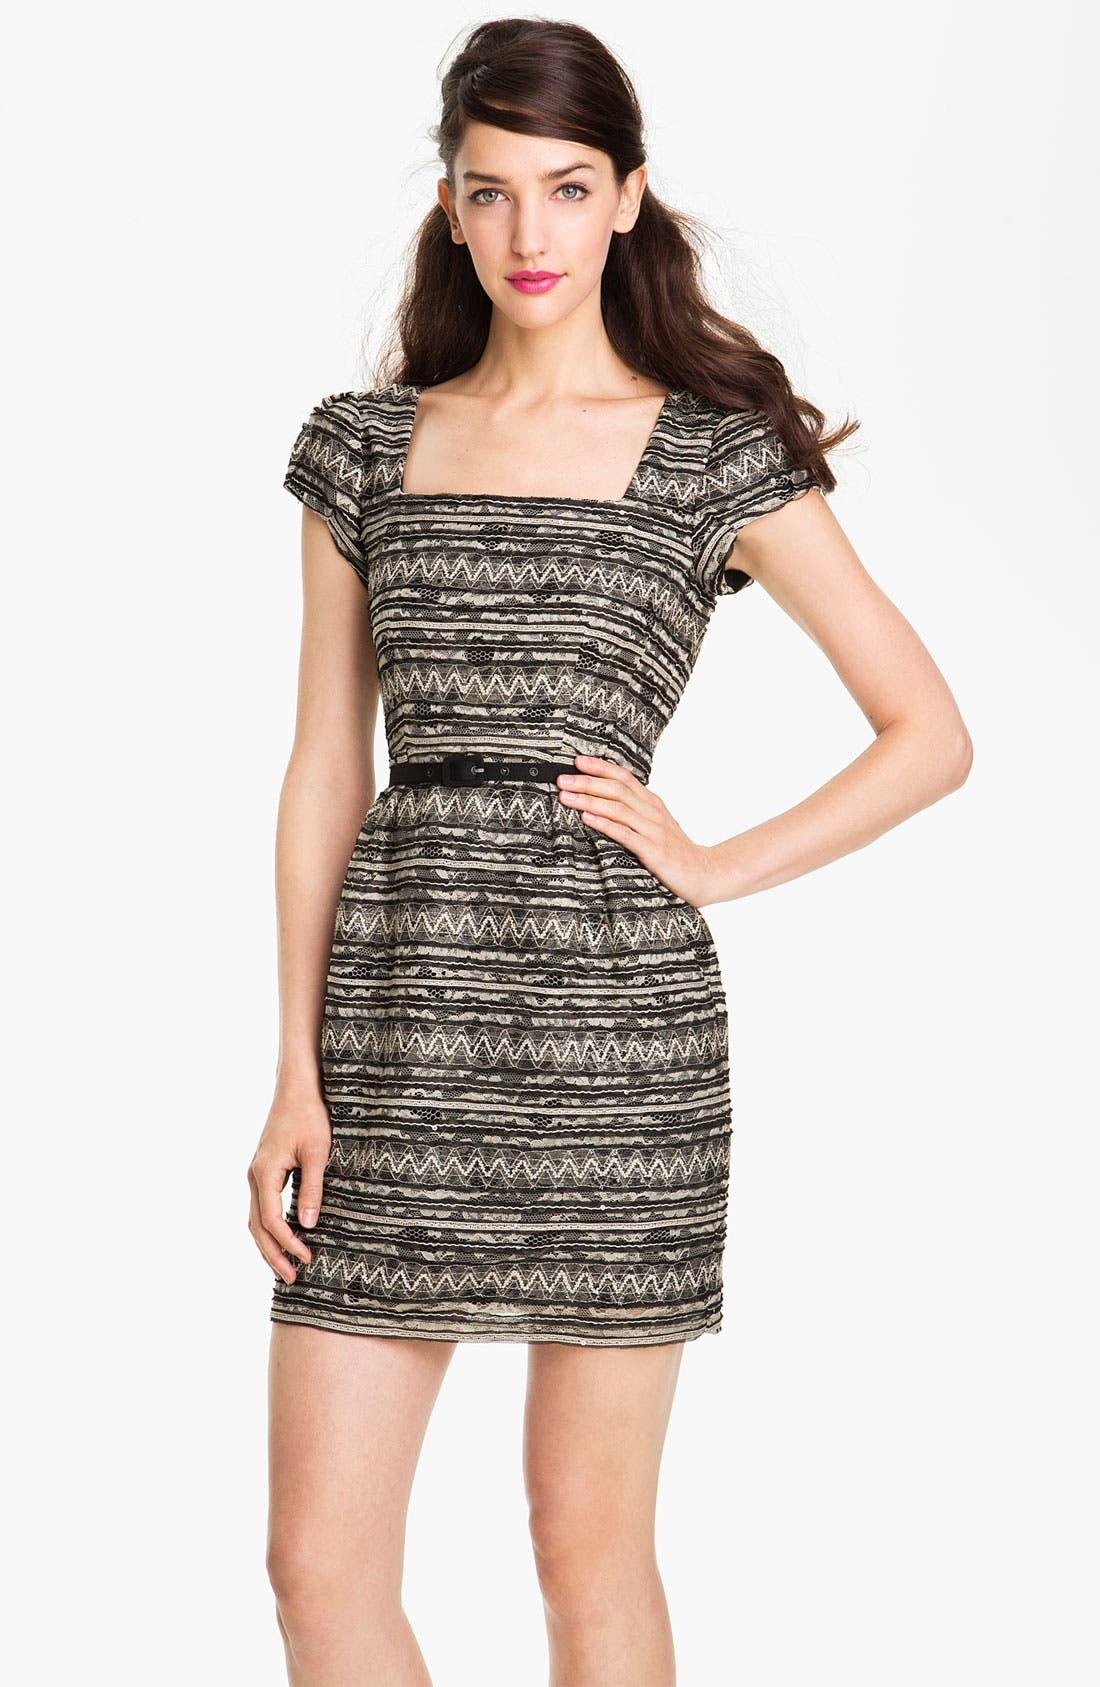 Alternate Image 1 Selected - Nanette Lepore 'Starfest' Belted Lace Sheath Dress